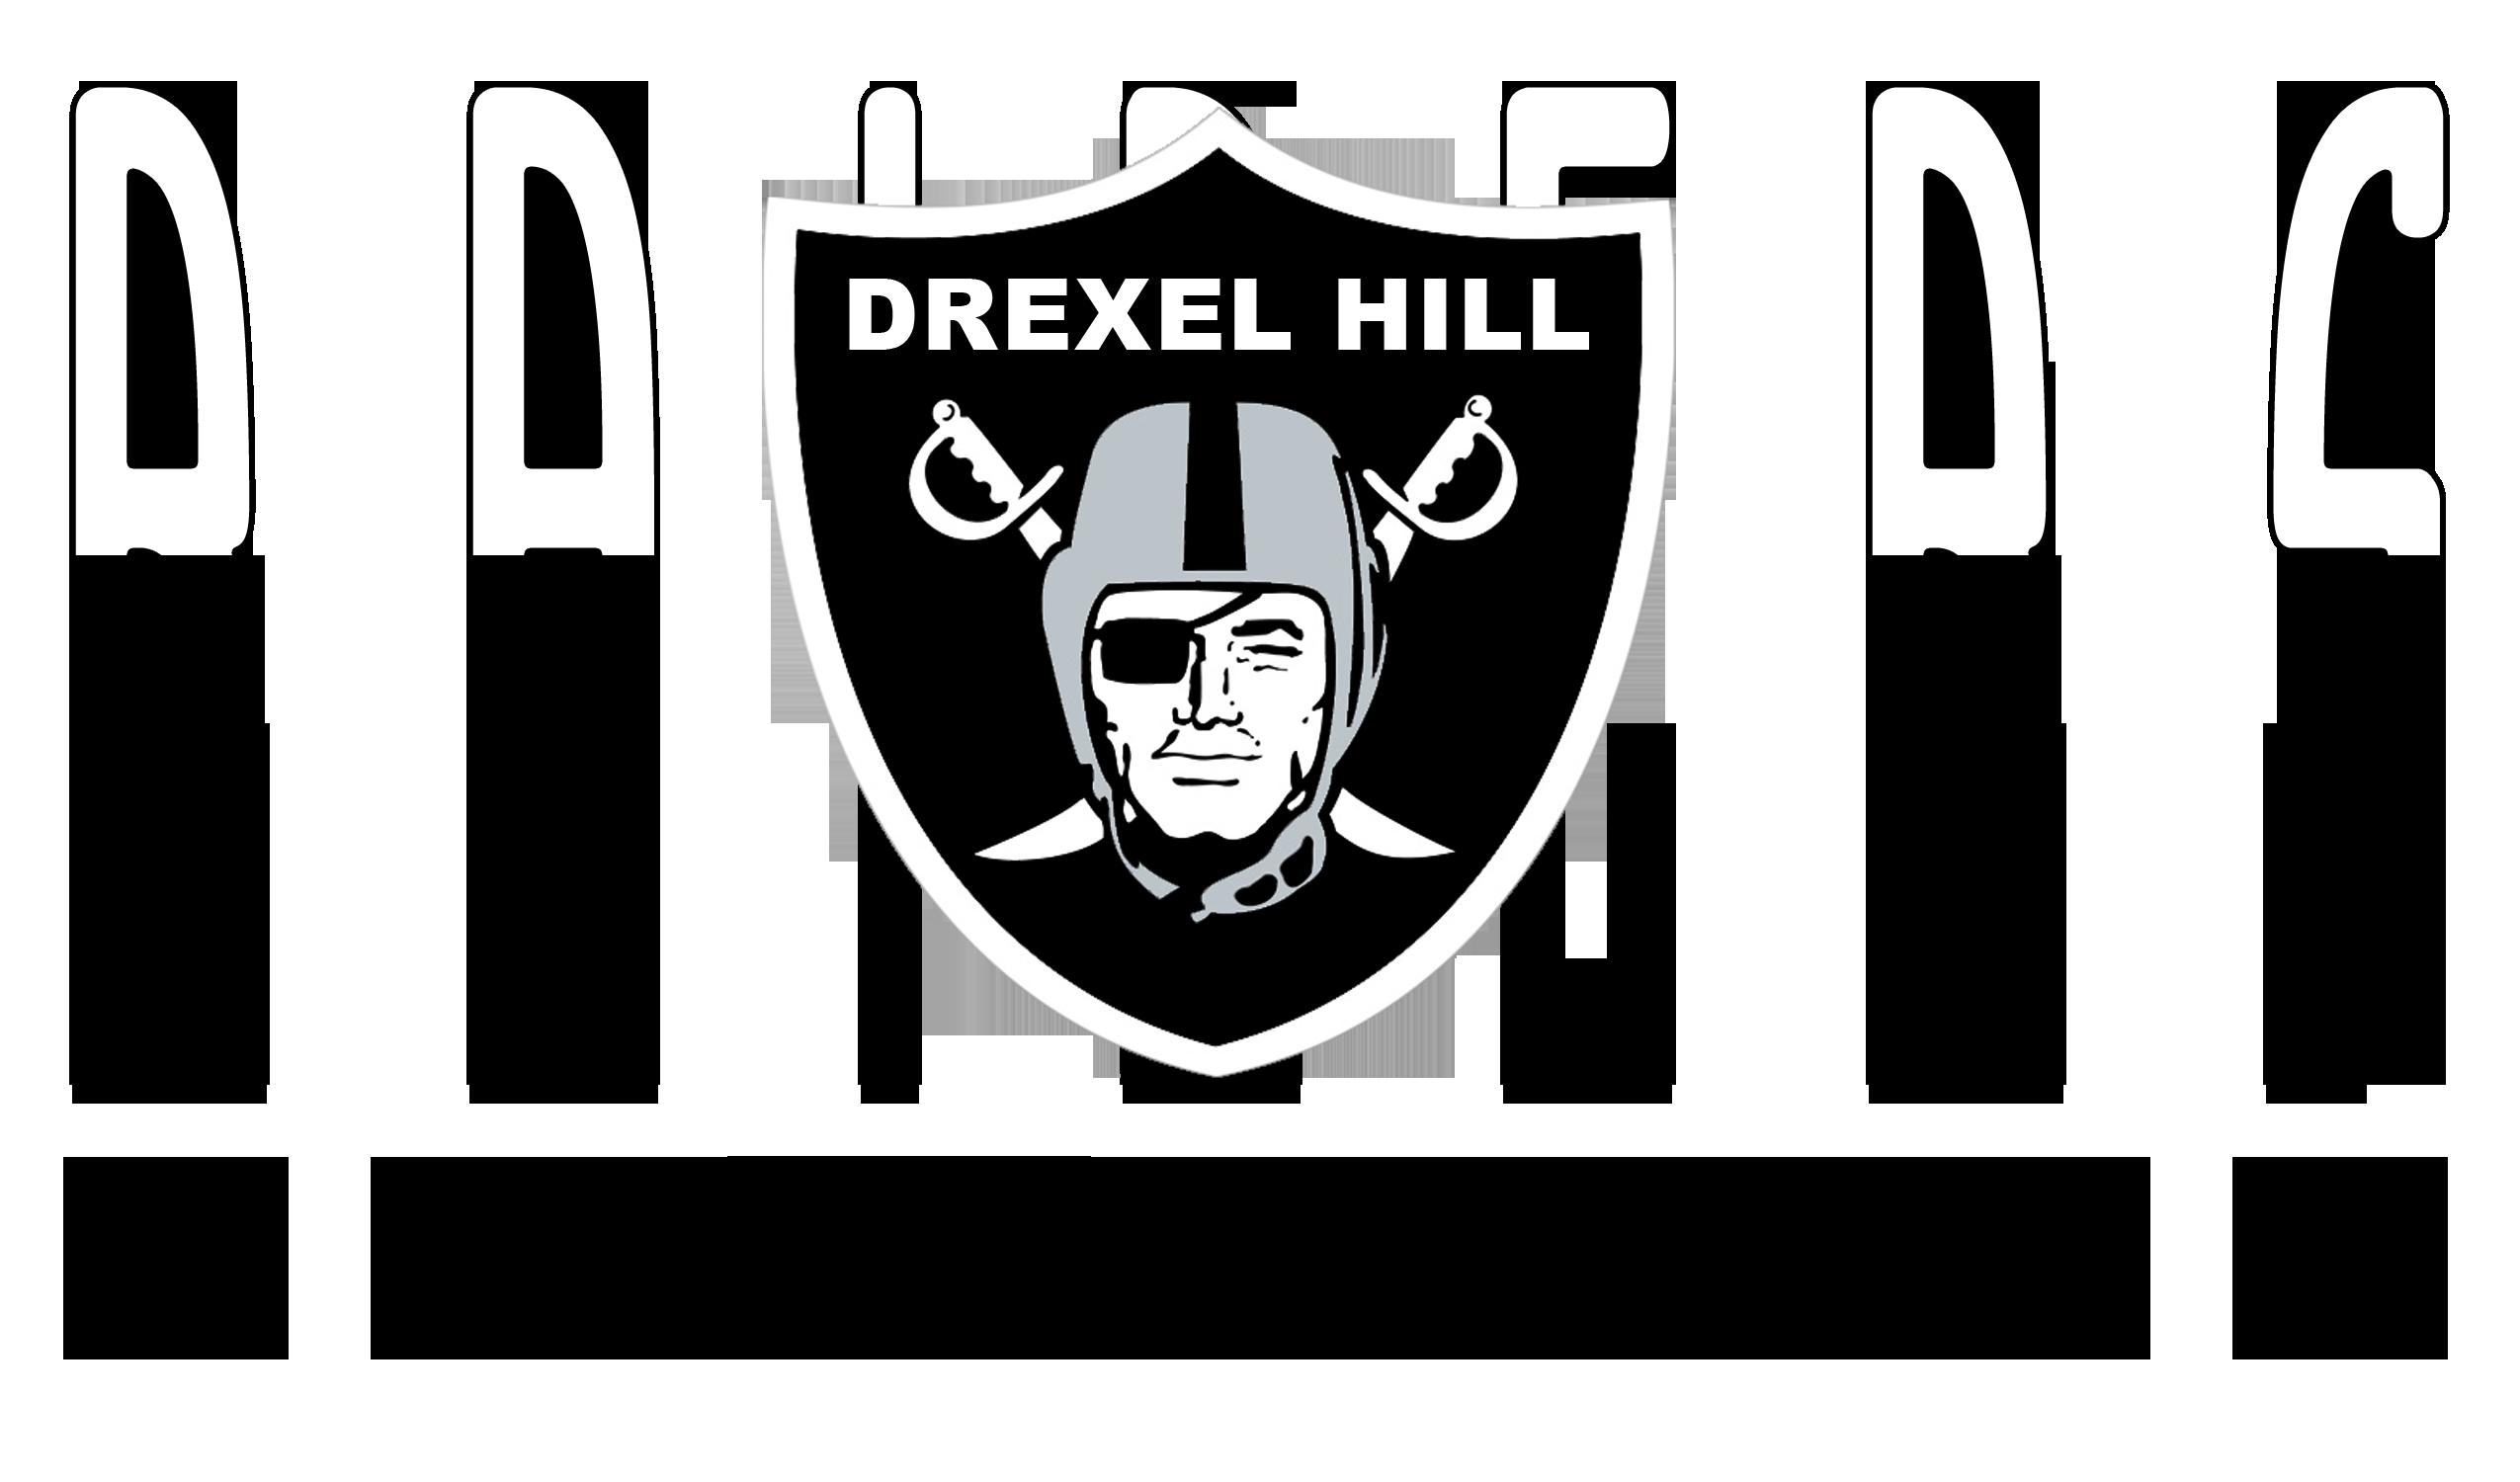 Girl flag football clipart svg freeuse library Football Home | Drexel Hill Raiders svg freeuse library